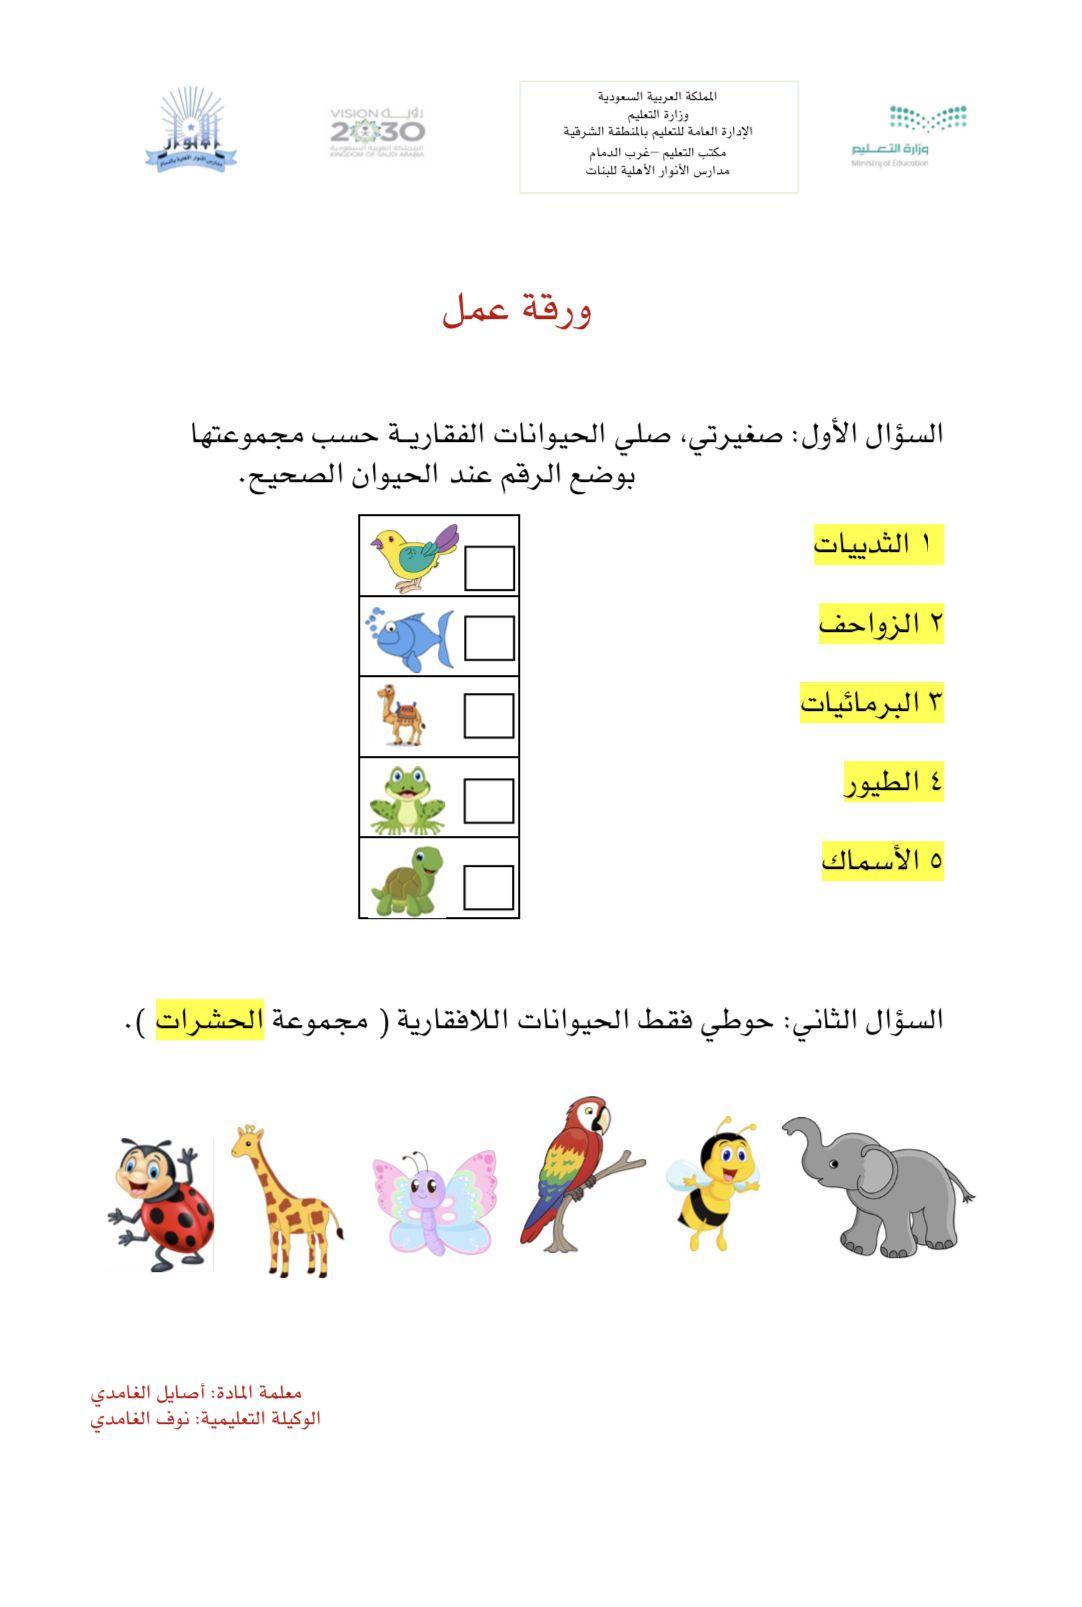 Pin By Alaa Alshanbari On واجبات Map Map Screenshot